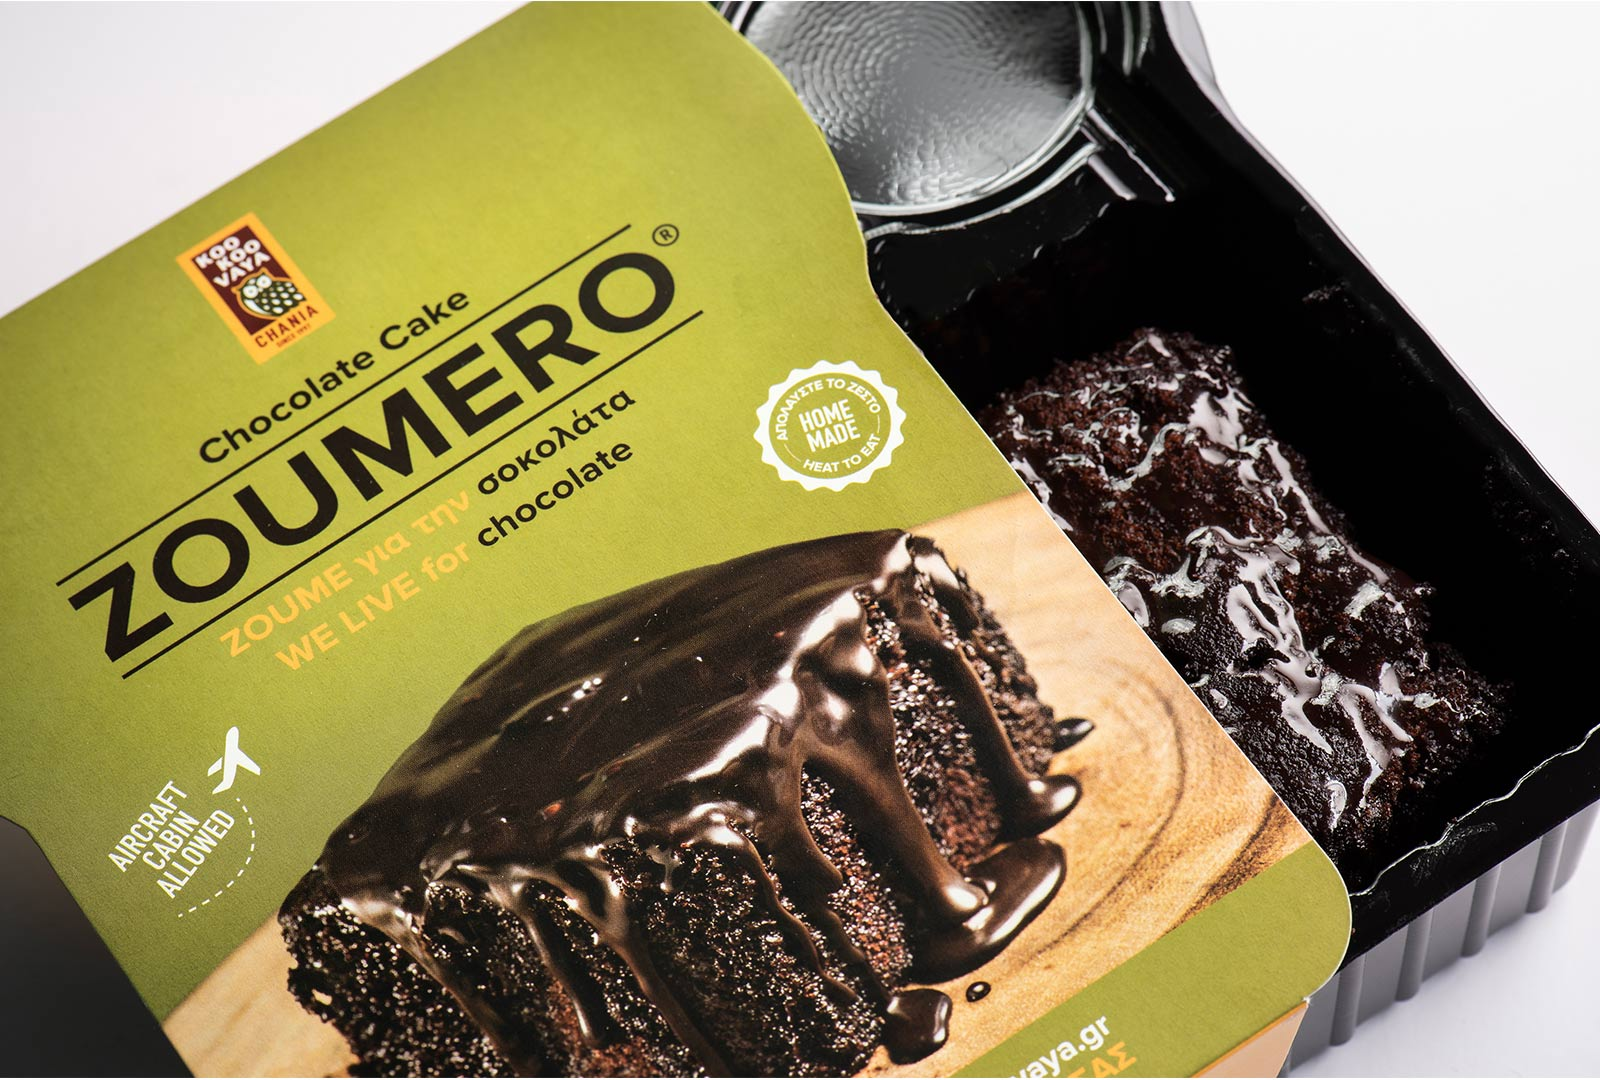 Yiaki Design Create New Packaging Design for Koukouvaya Choclate Cake